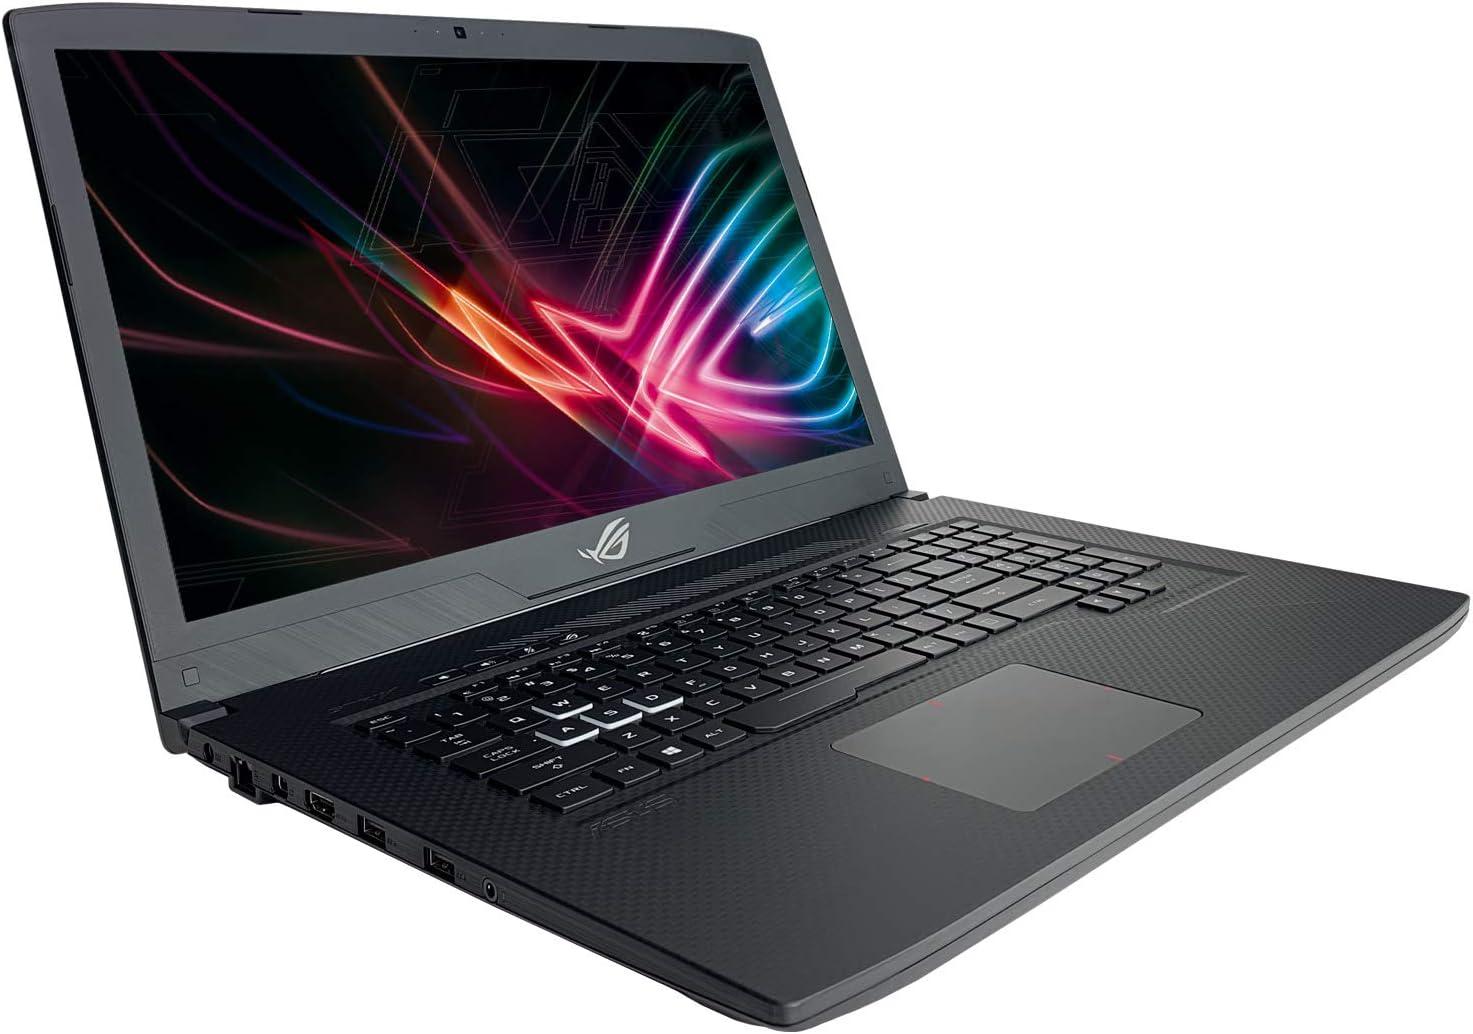 "ASUS ROG GL703GE Strix Scar Edition Gaming 17.3"" Full HD Laptop - 8th Gen i7-8750H Processor up to 4.10 GHz, 16GB Memory, 256GB SSD + 1TB HDD, 4GB NVIDIA GeForce GTX 1050Ti Graphics, Windows 10"